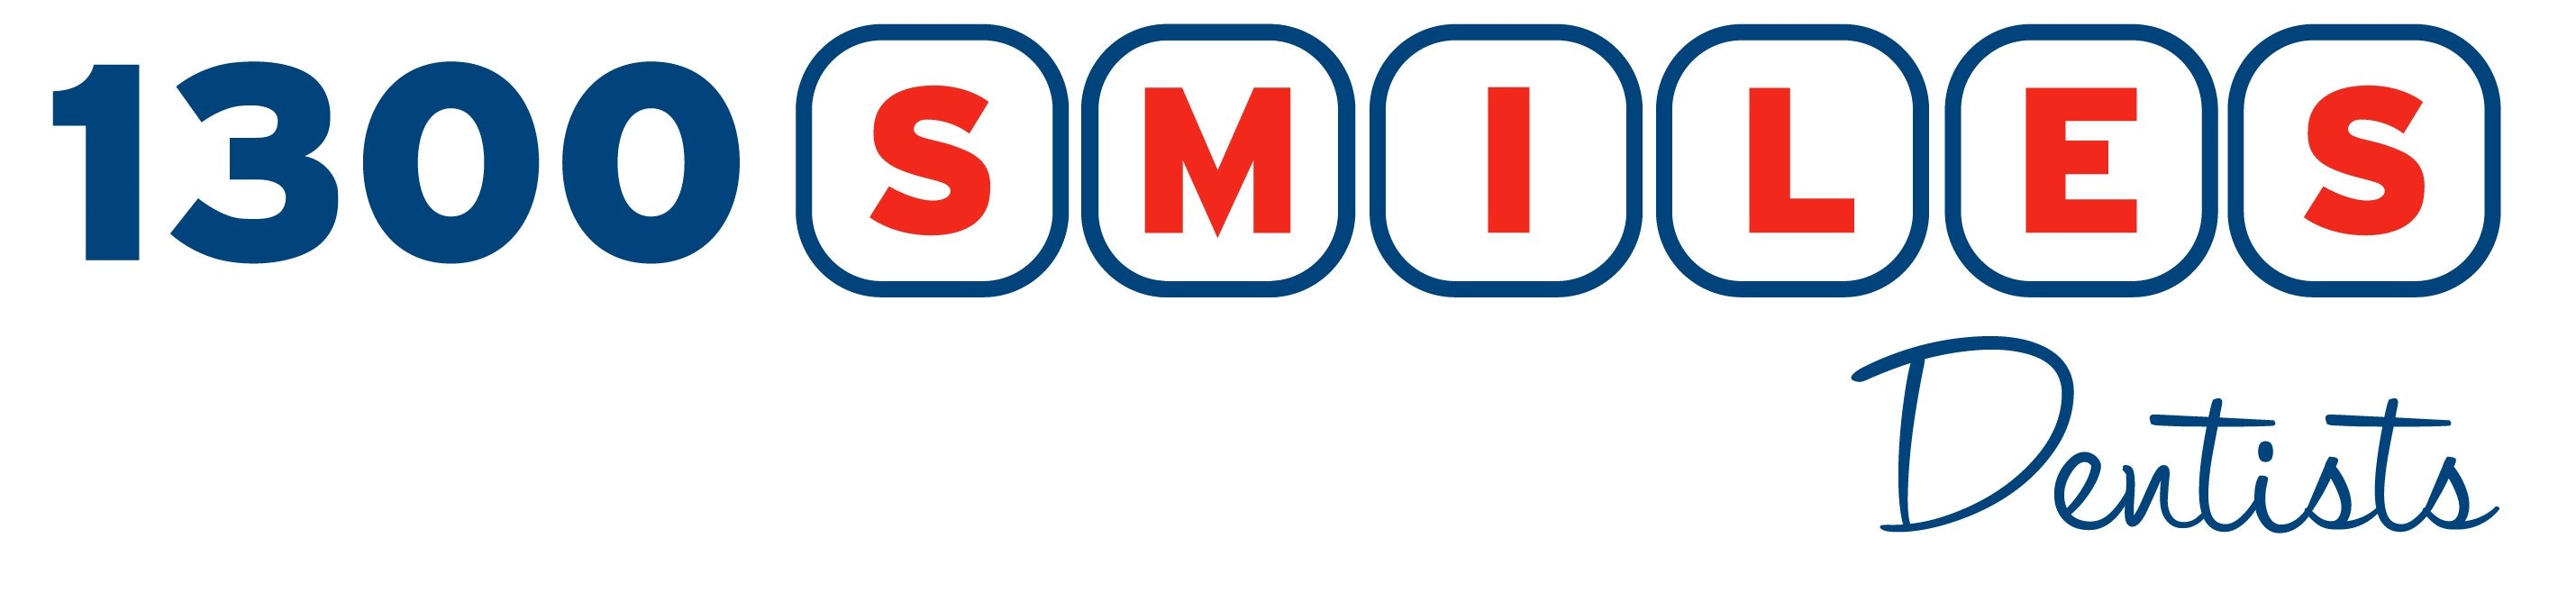 logo for 1300 Smiles - Mackay Dentists